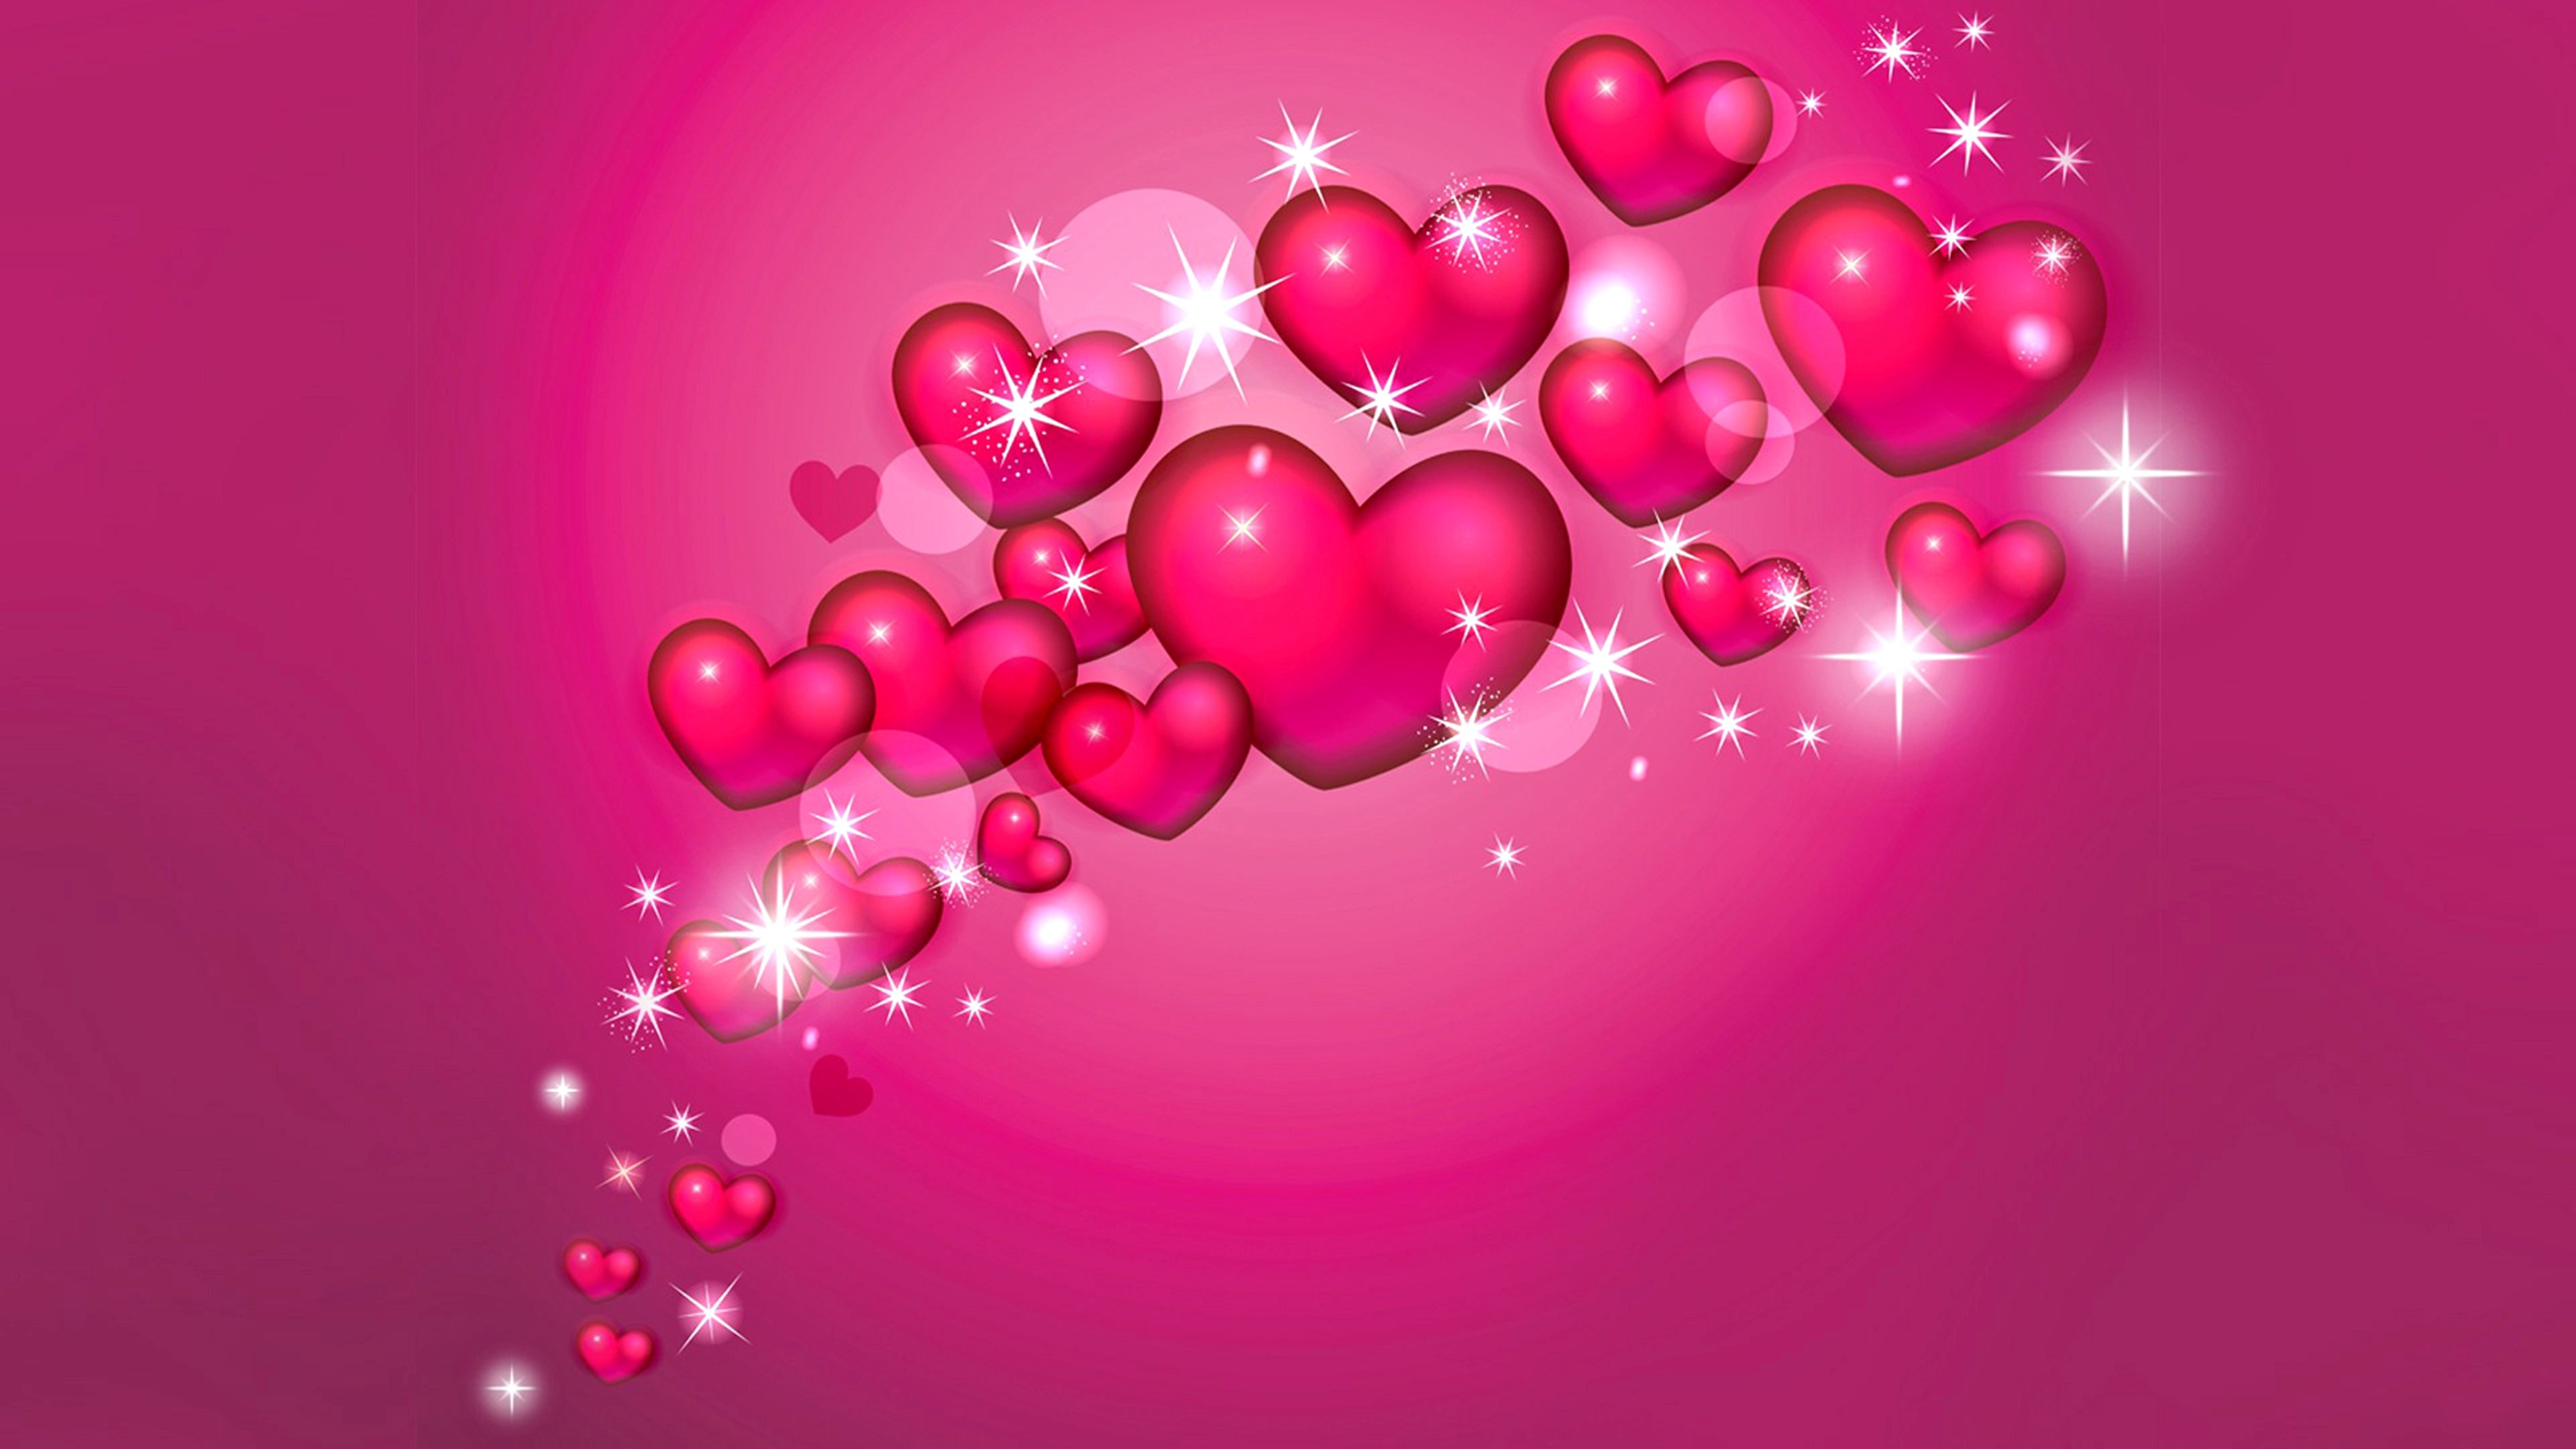 Pink Rose Heart Wallpapers Stars Fantasy Love Wallpaper 3840x2160